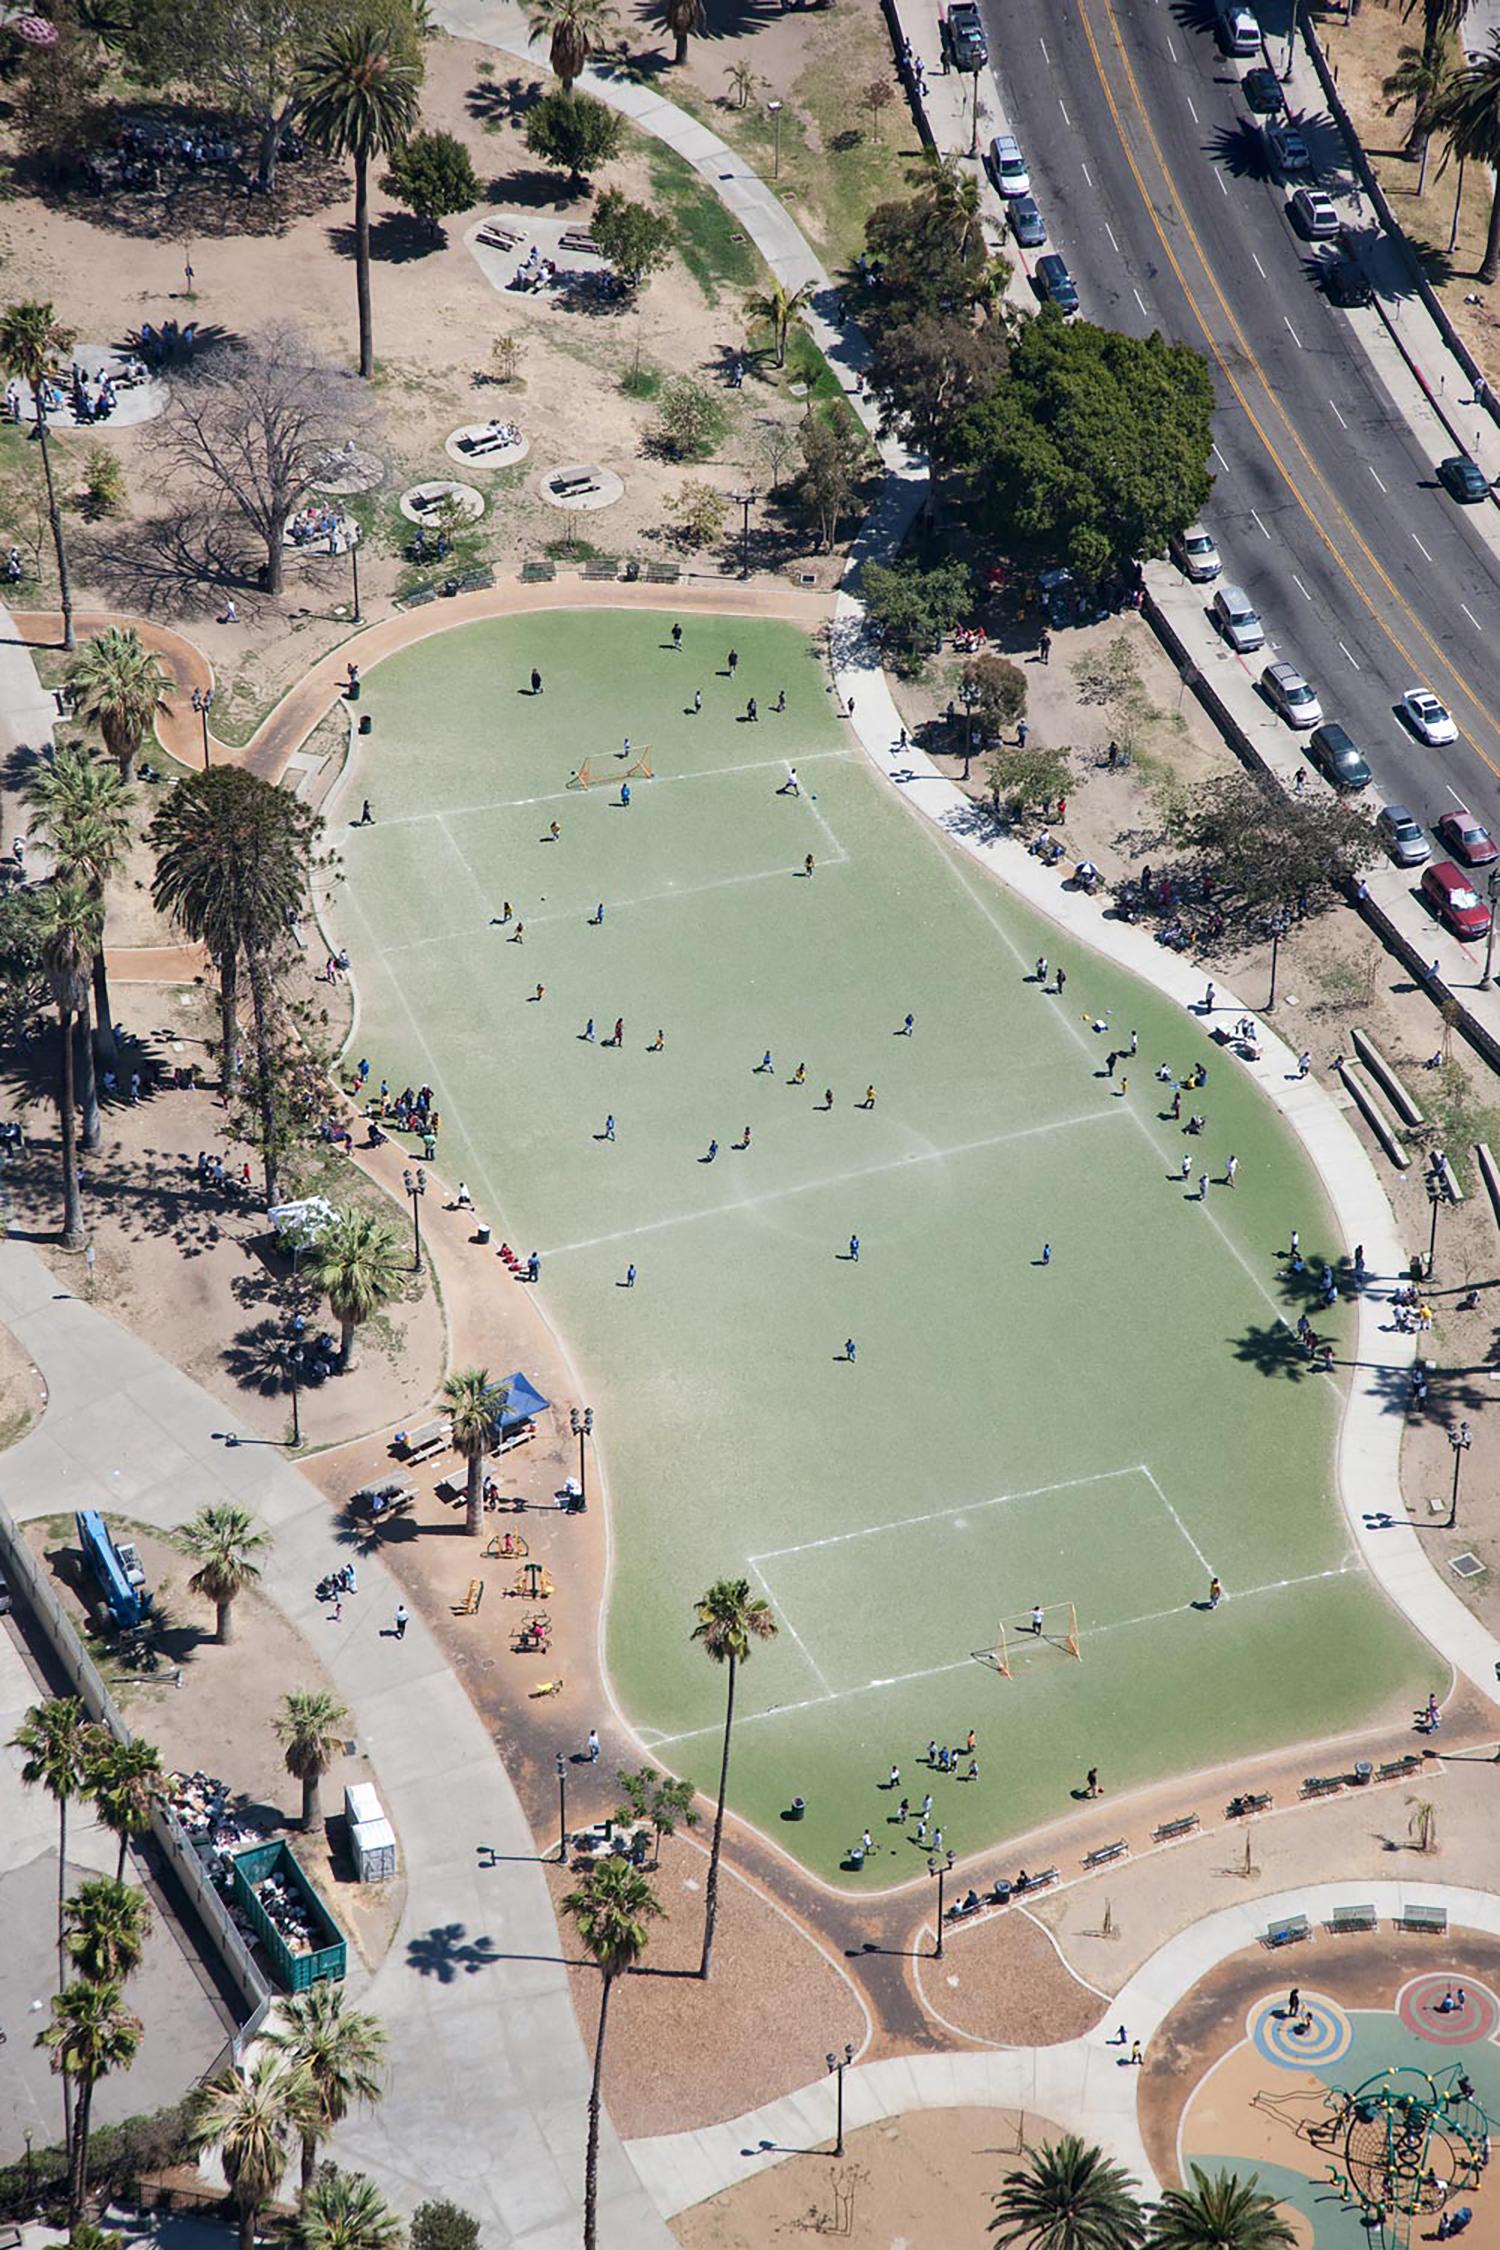 MacArthur Park, Los Angeles, California, 2011